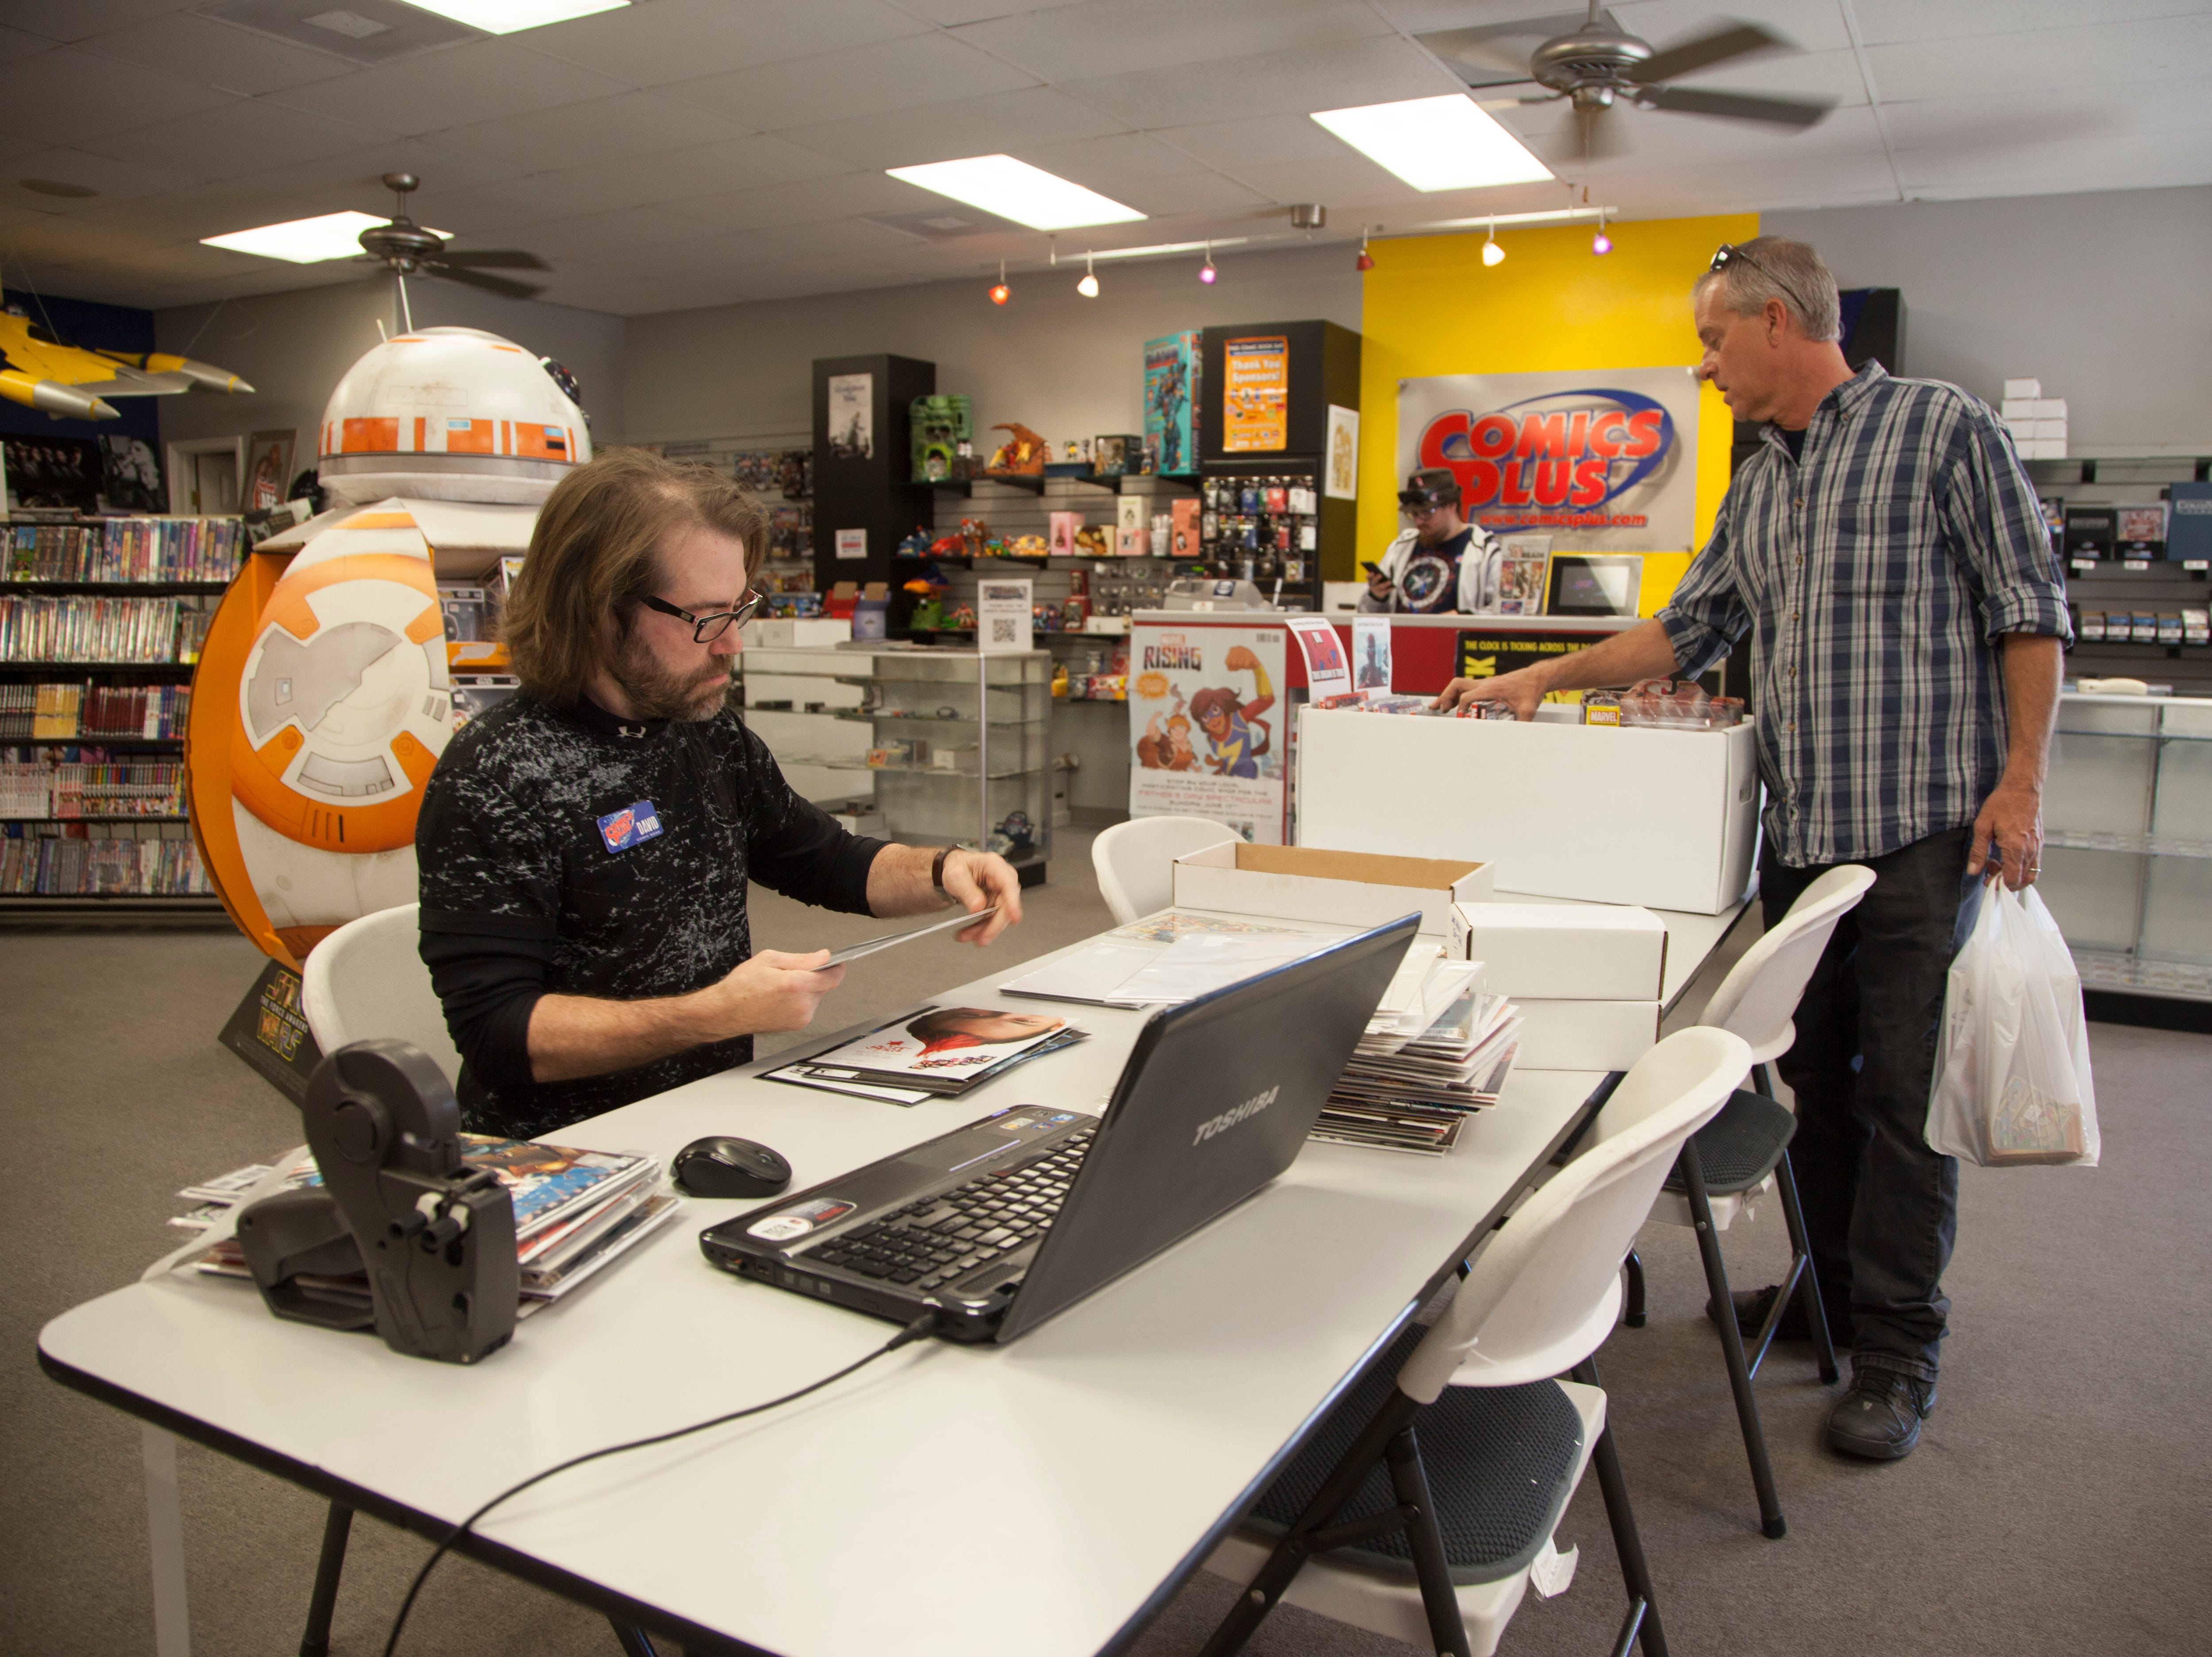 Community members recognize Small Business Saturday at Comics Plus Saturday, Nov. 24, 2018.